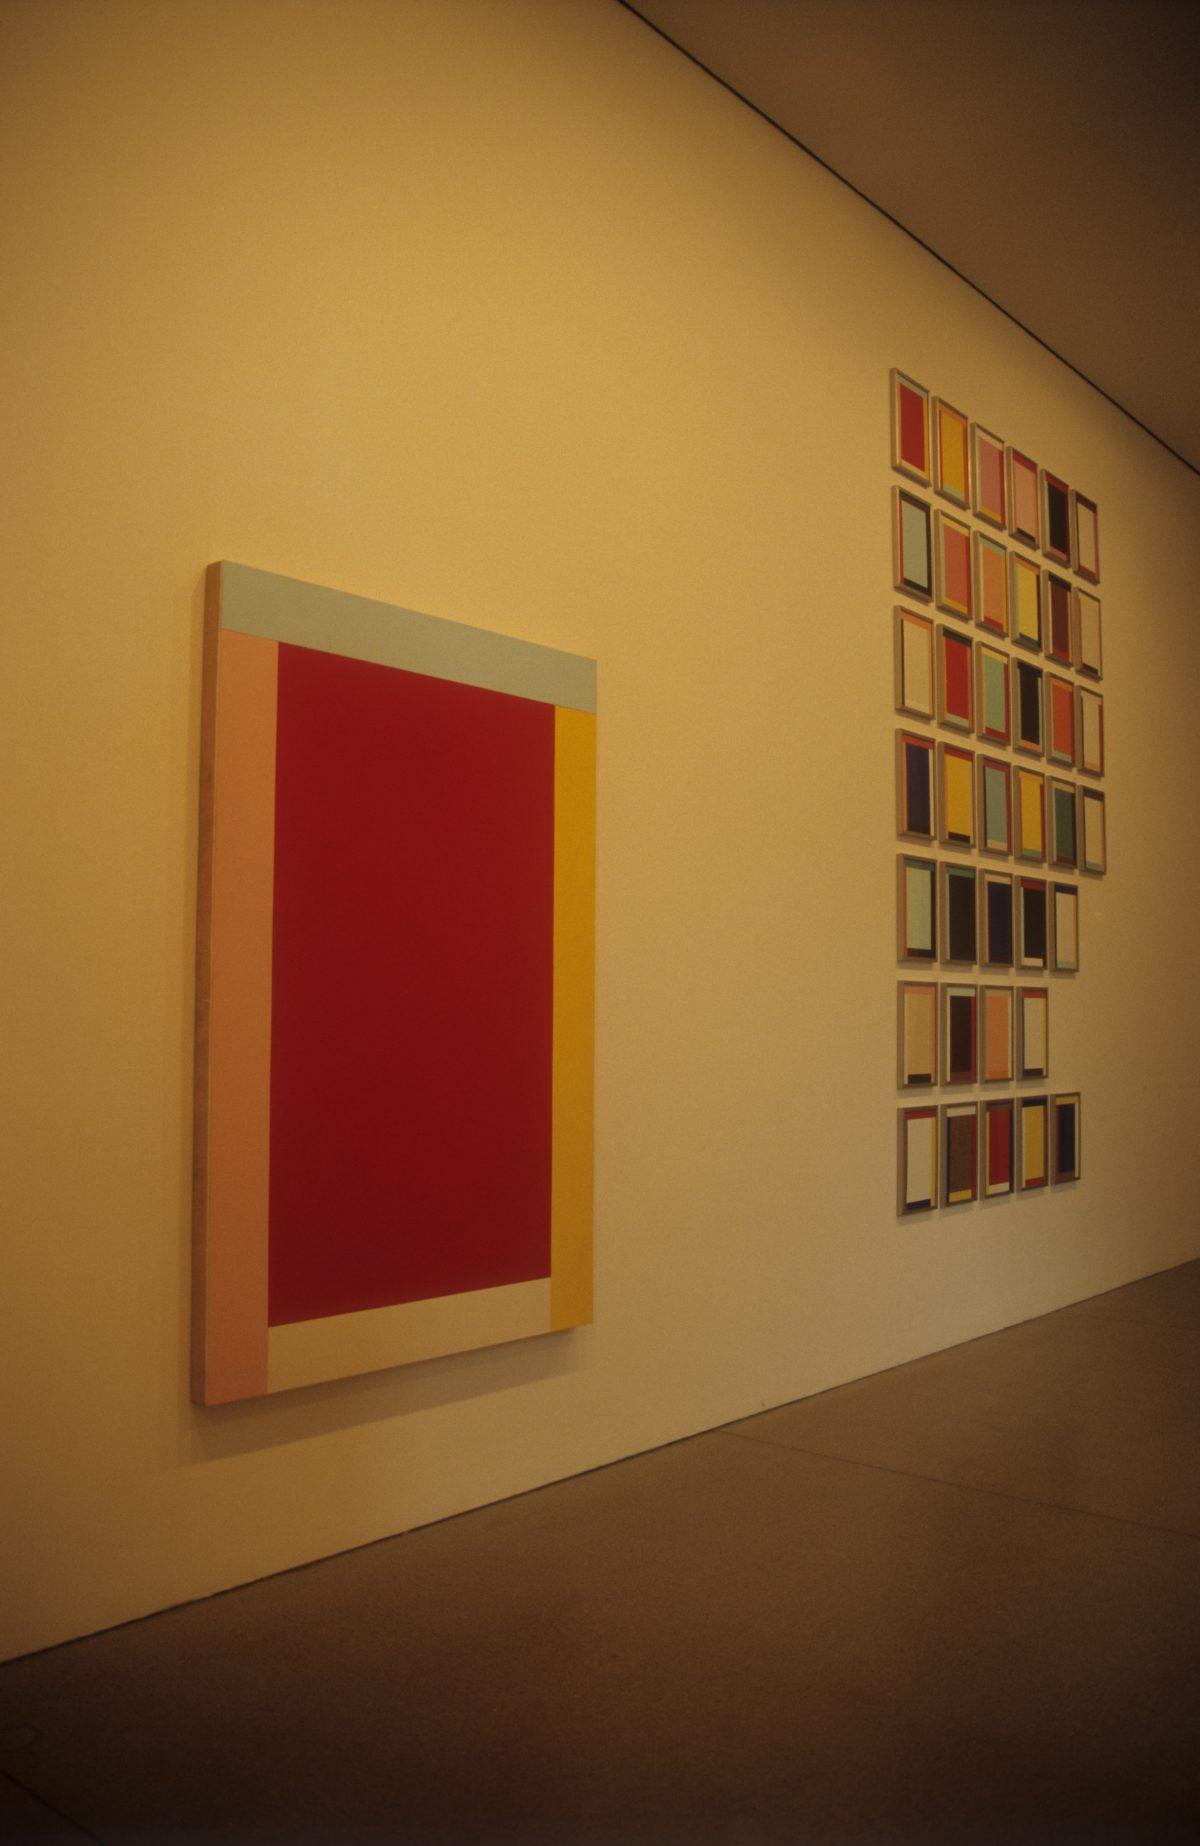 Modern art - At, art, museum, painting